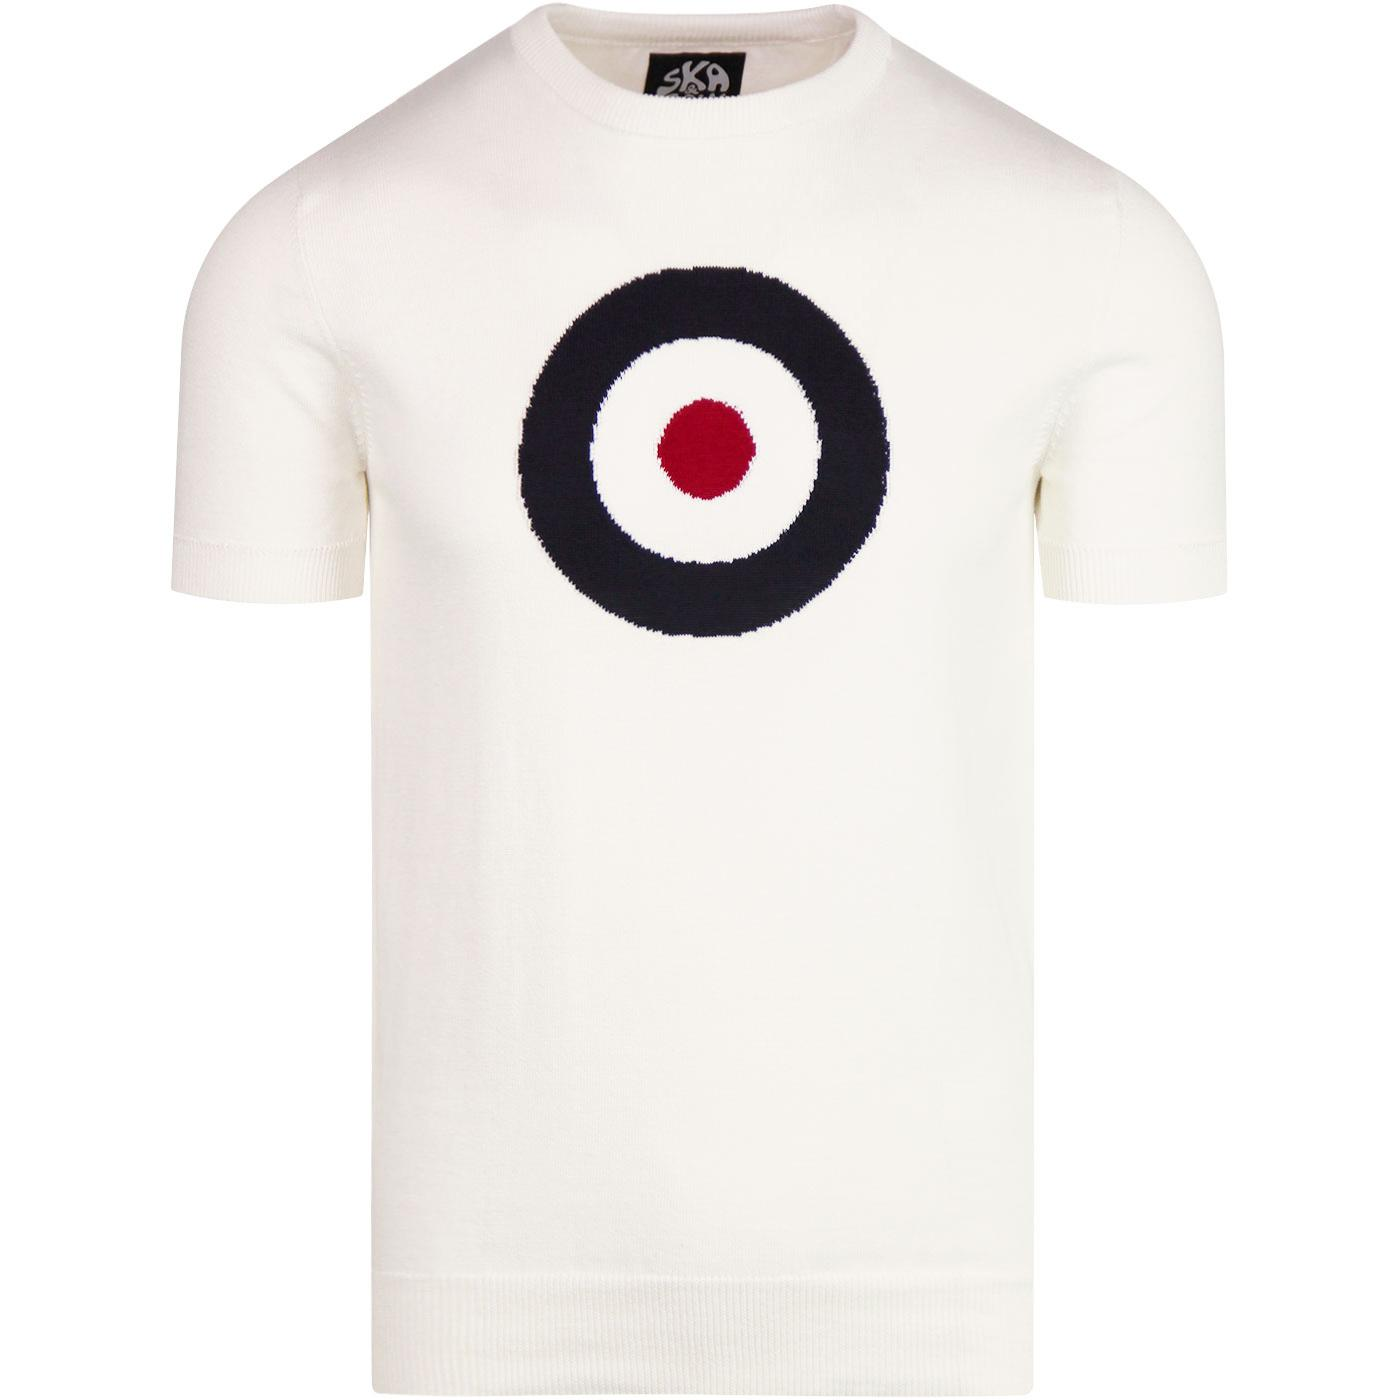 SKA & SOUL Mod Target Retro Knitted T-shirt (Ecru)